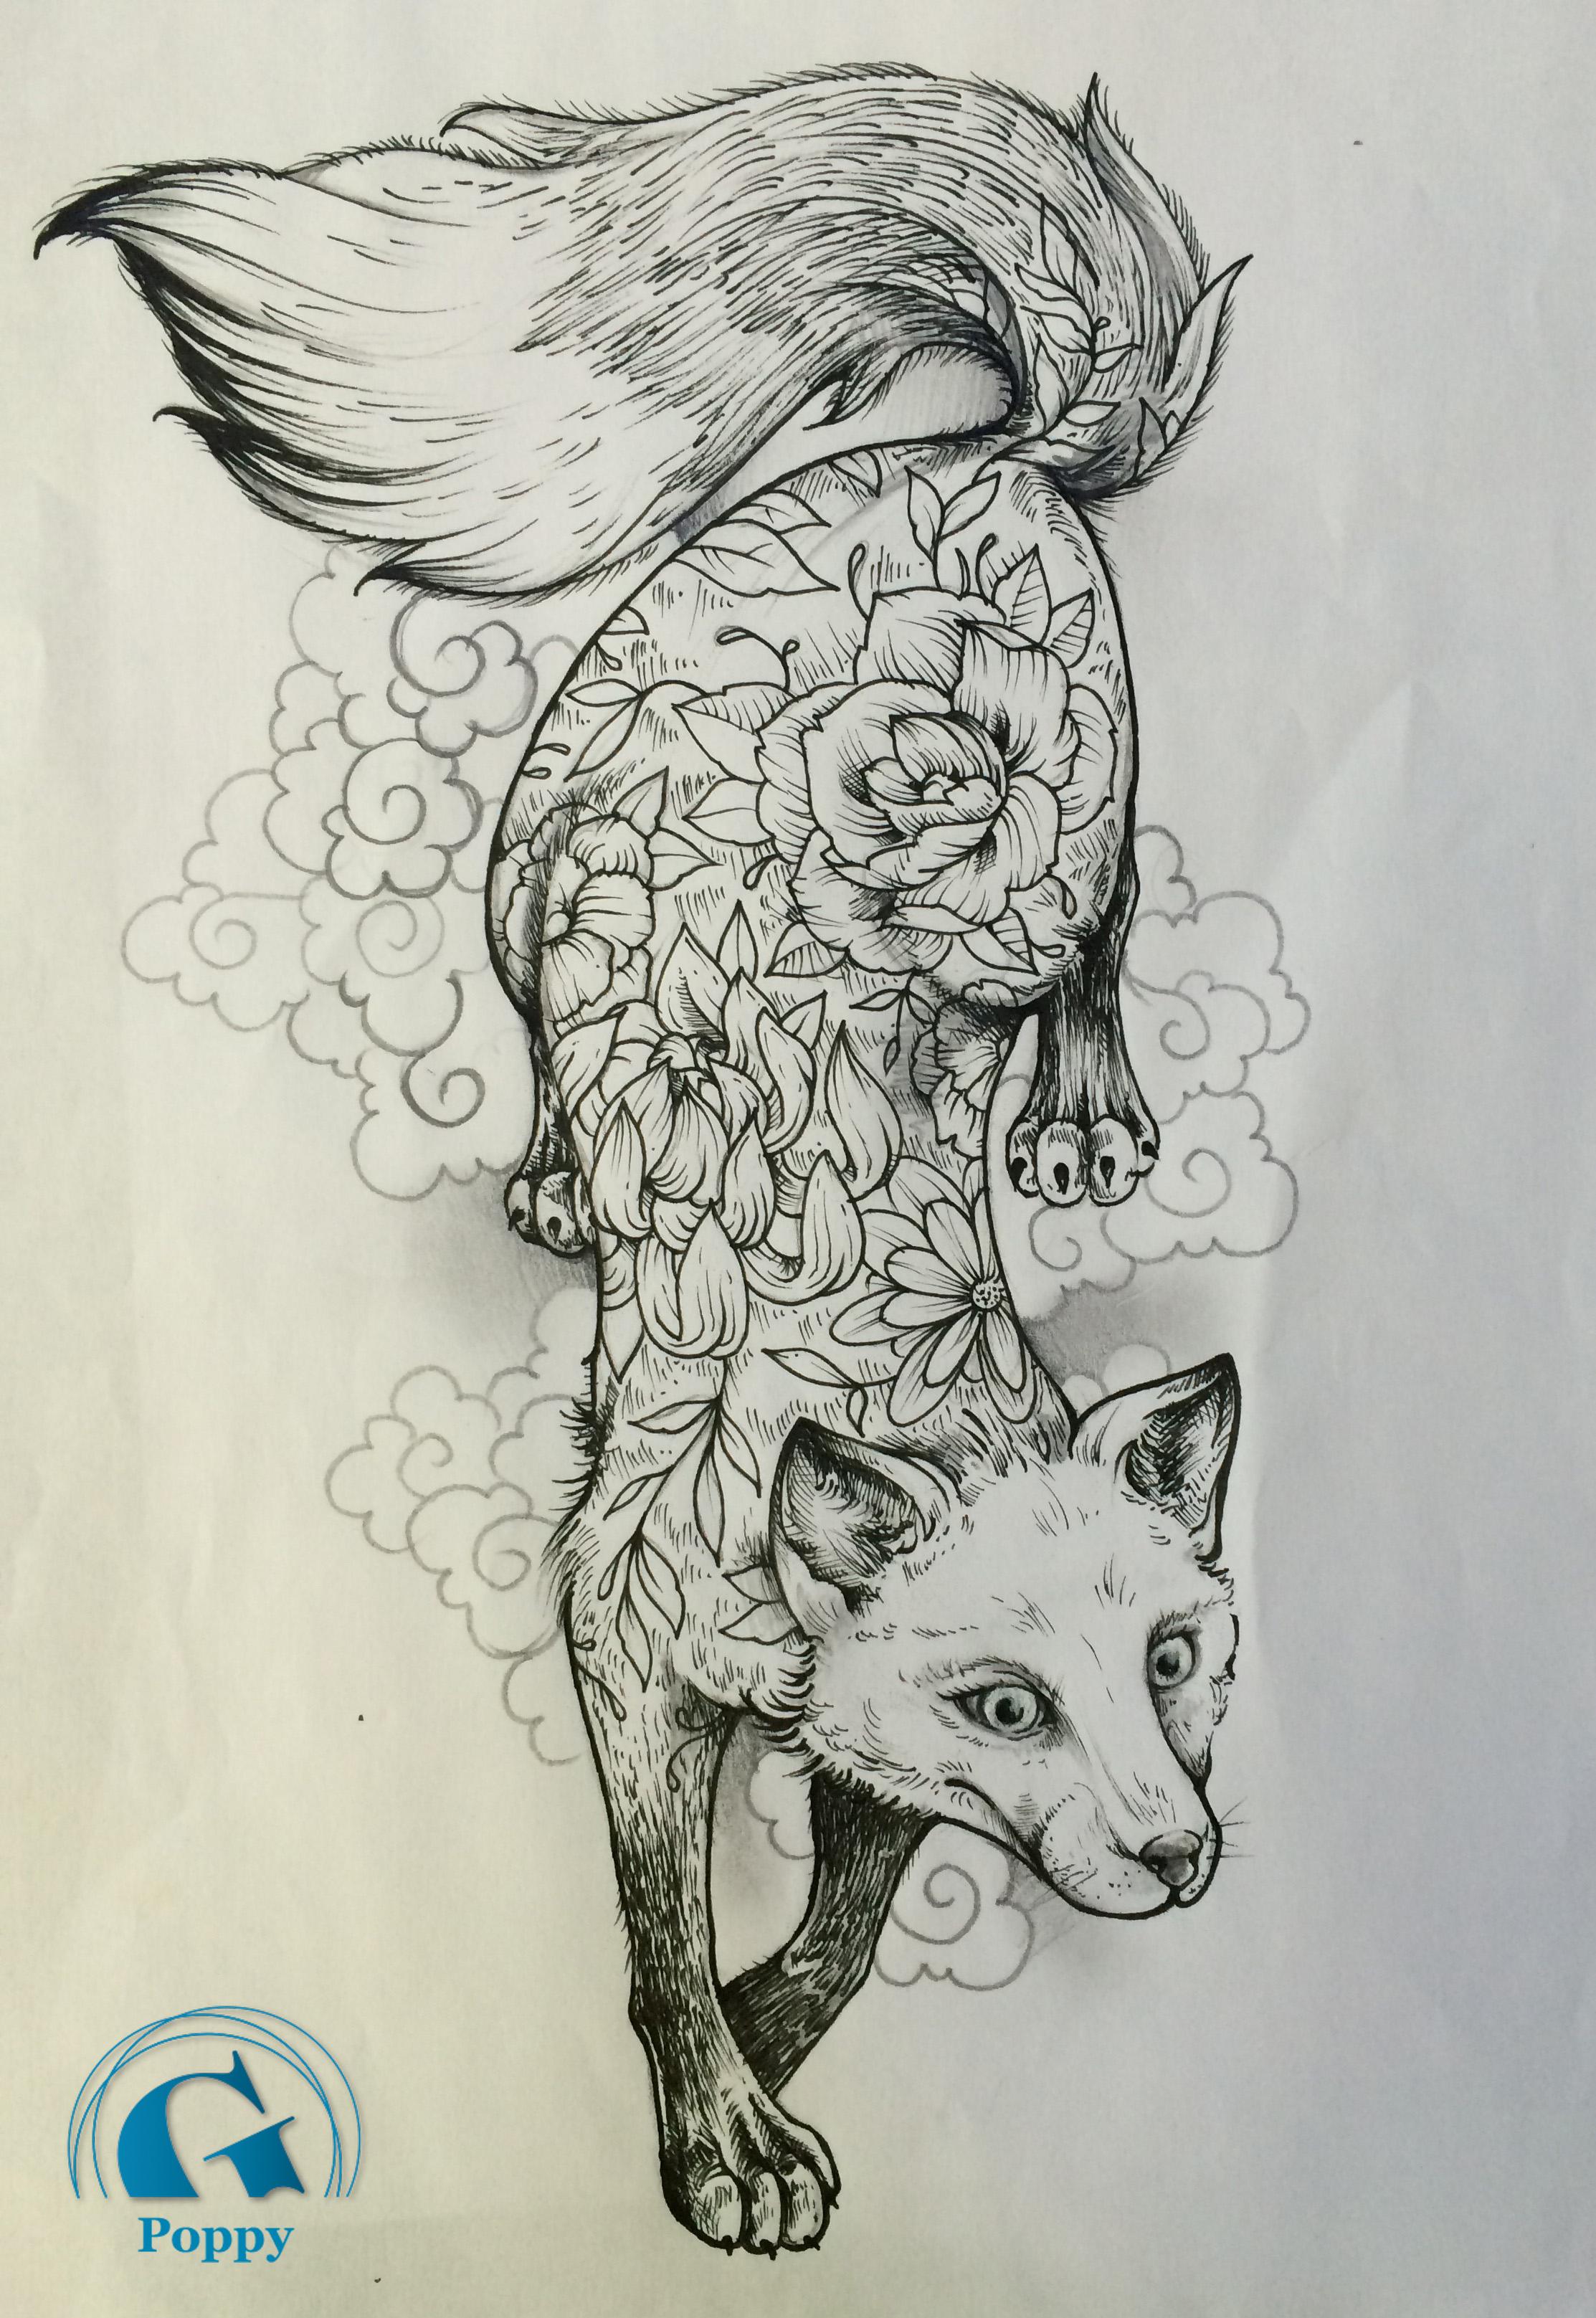 Dessin Idee Tatouage Renard Graphique Jpg Graphicaderme